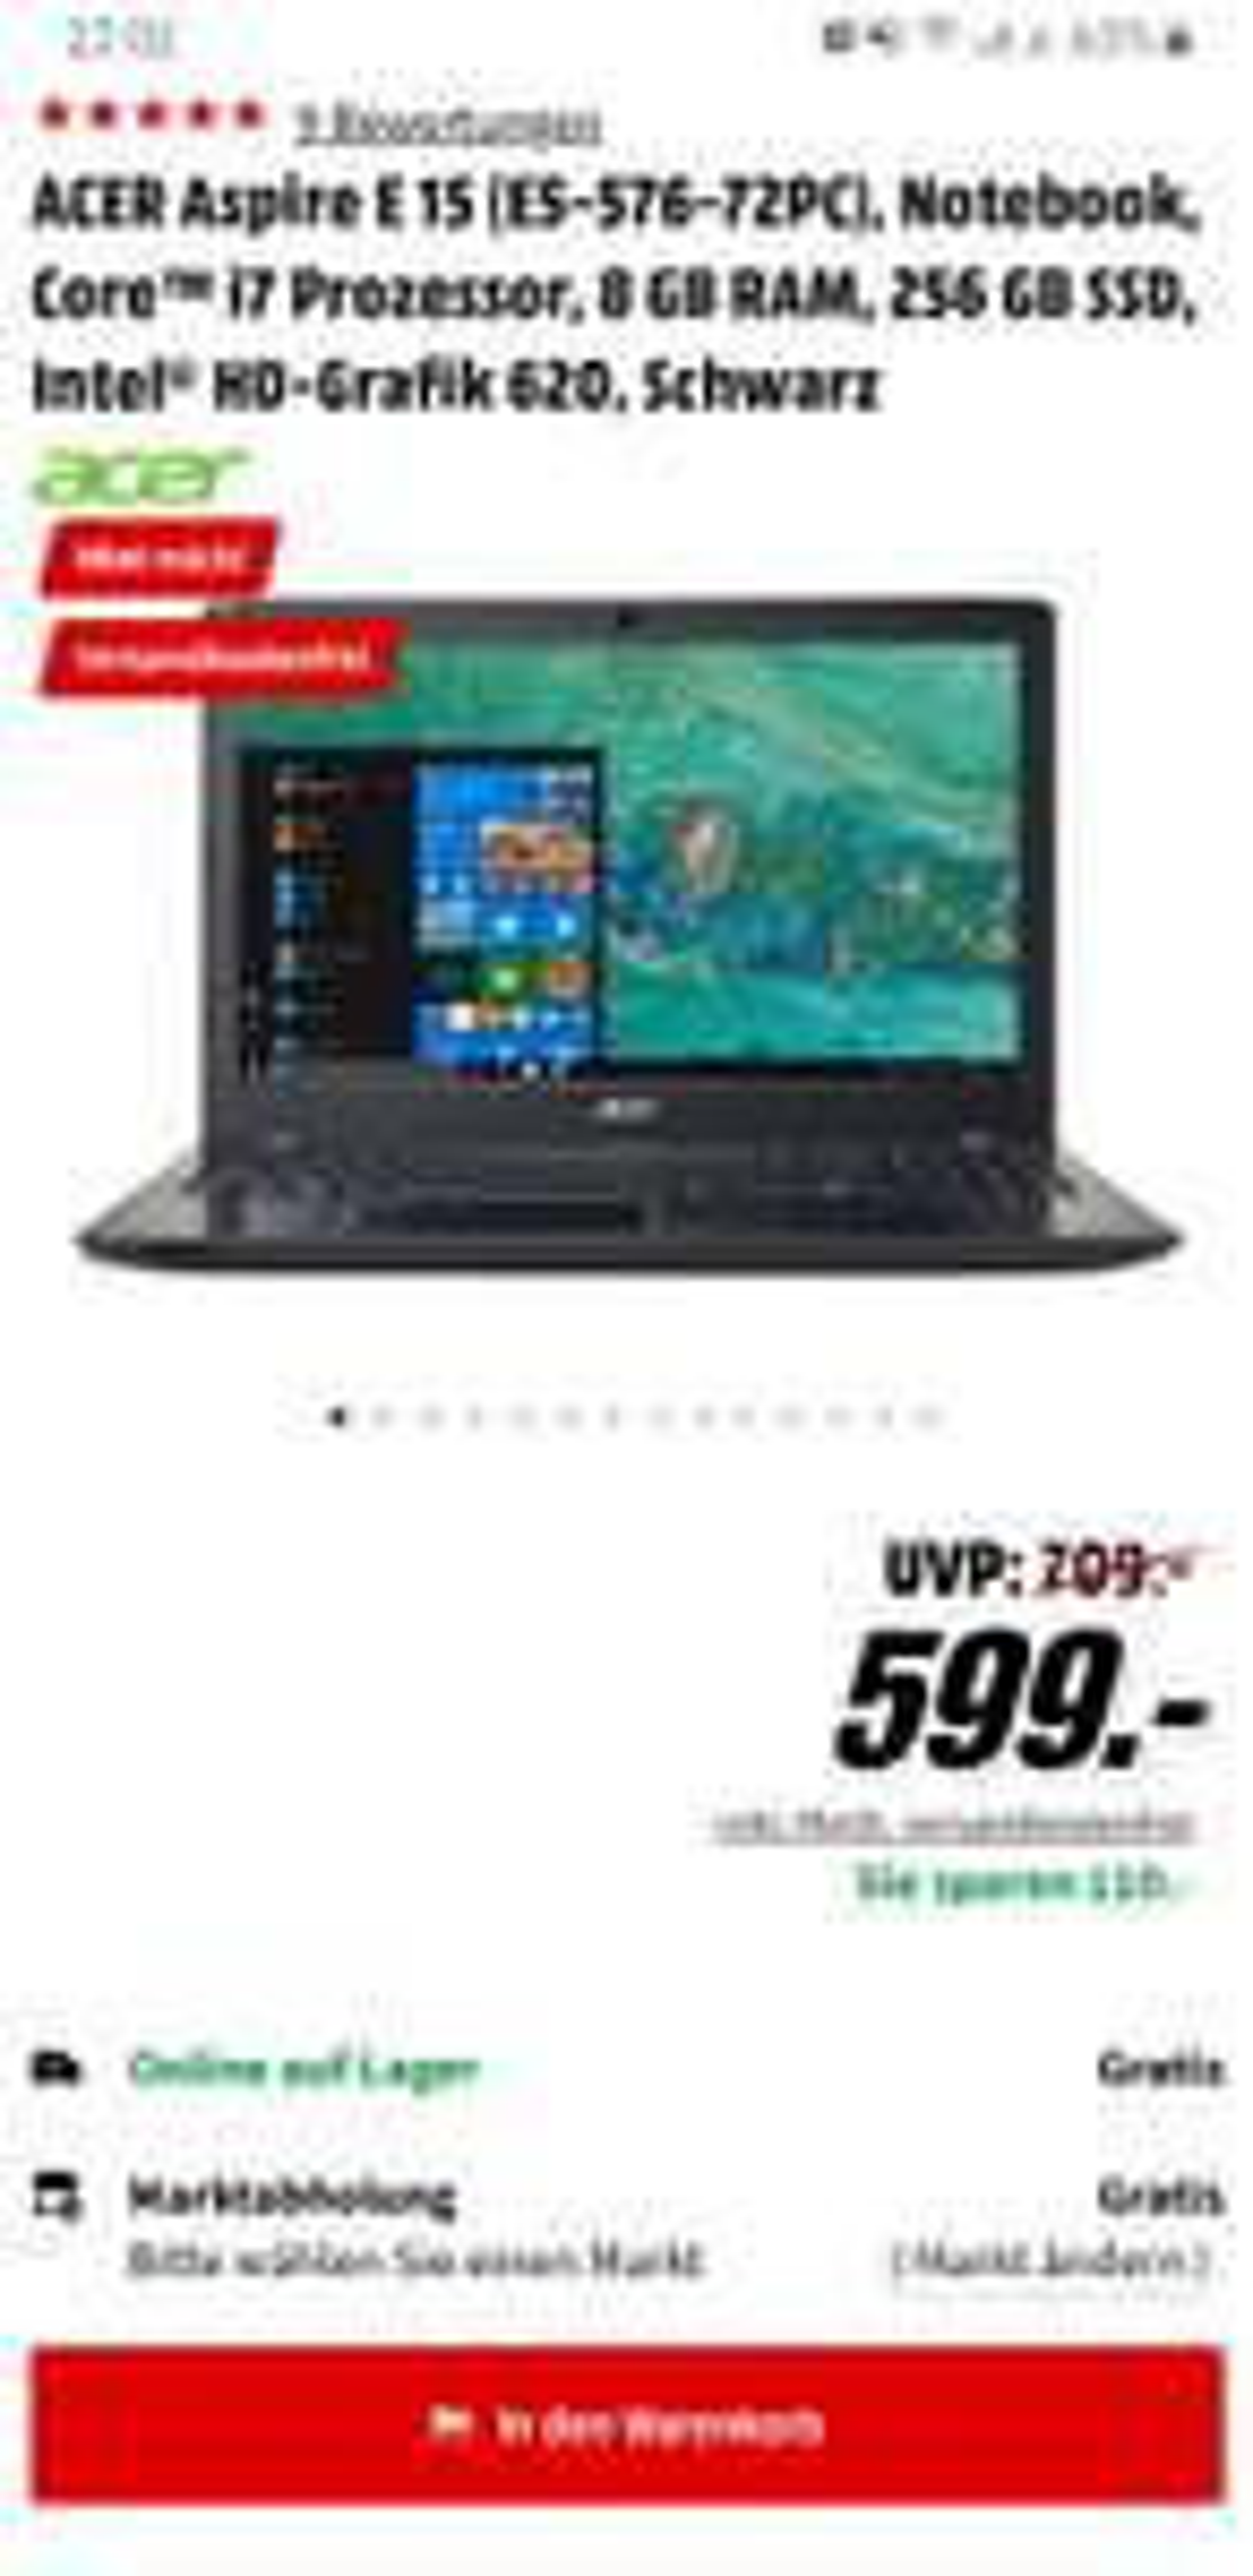 [Media Markt] ACER Aspire E15-Core™ i7 Prozessor,8 GB RAM,256 GB SSD, Intel® HD-Grafik 620,Full HD,Schwarz- Versandkostenfrei